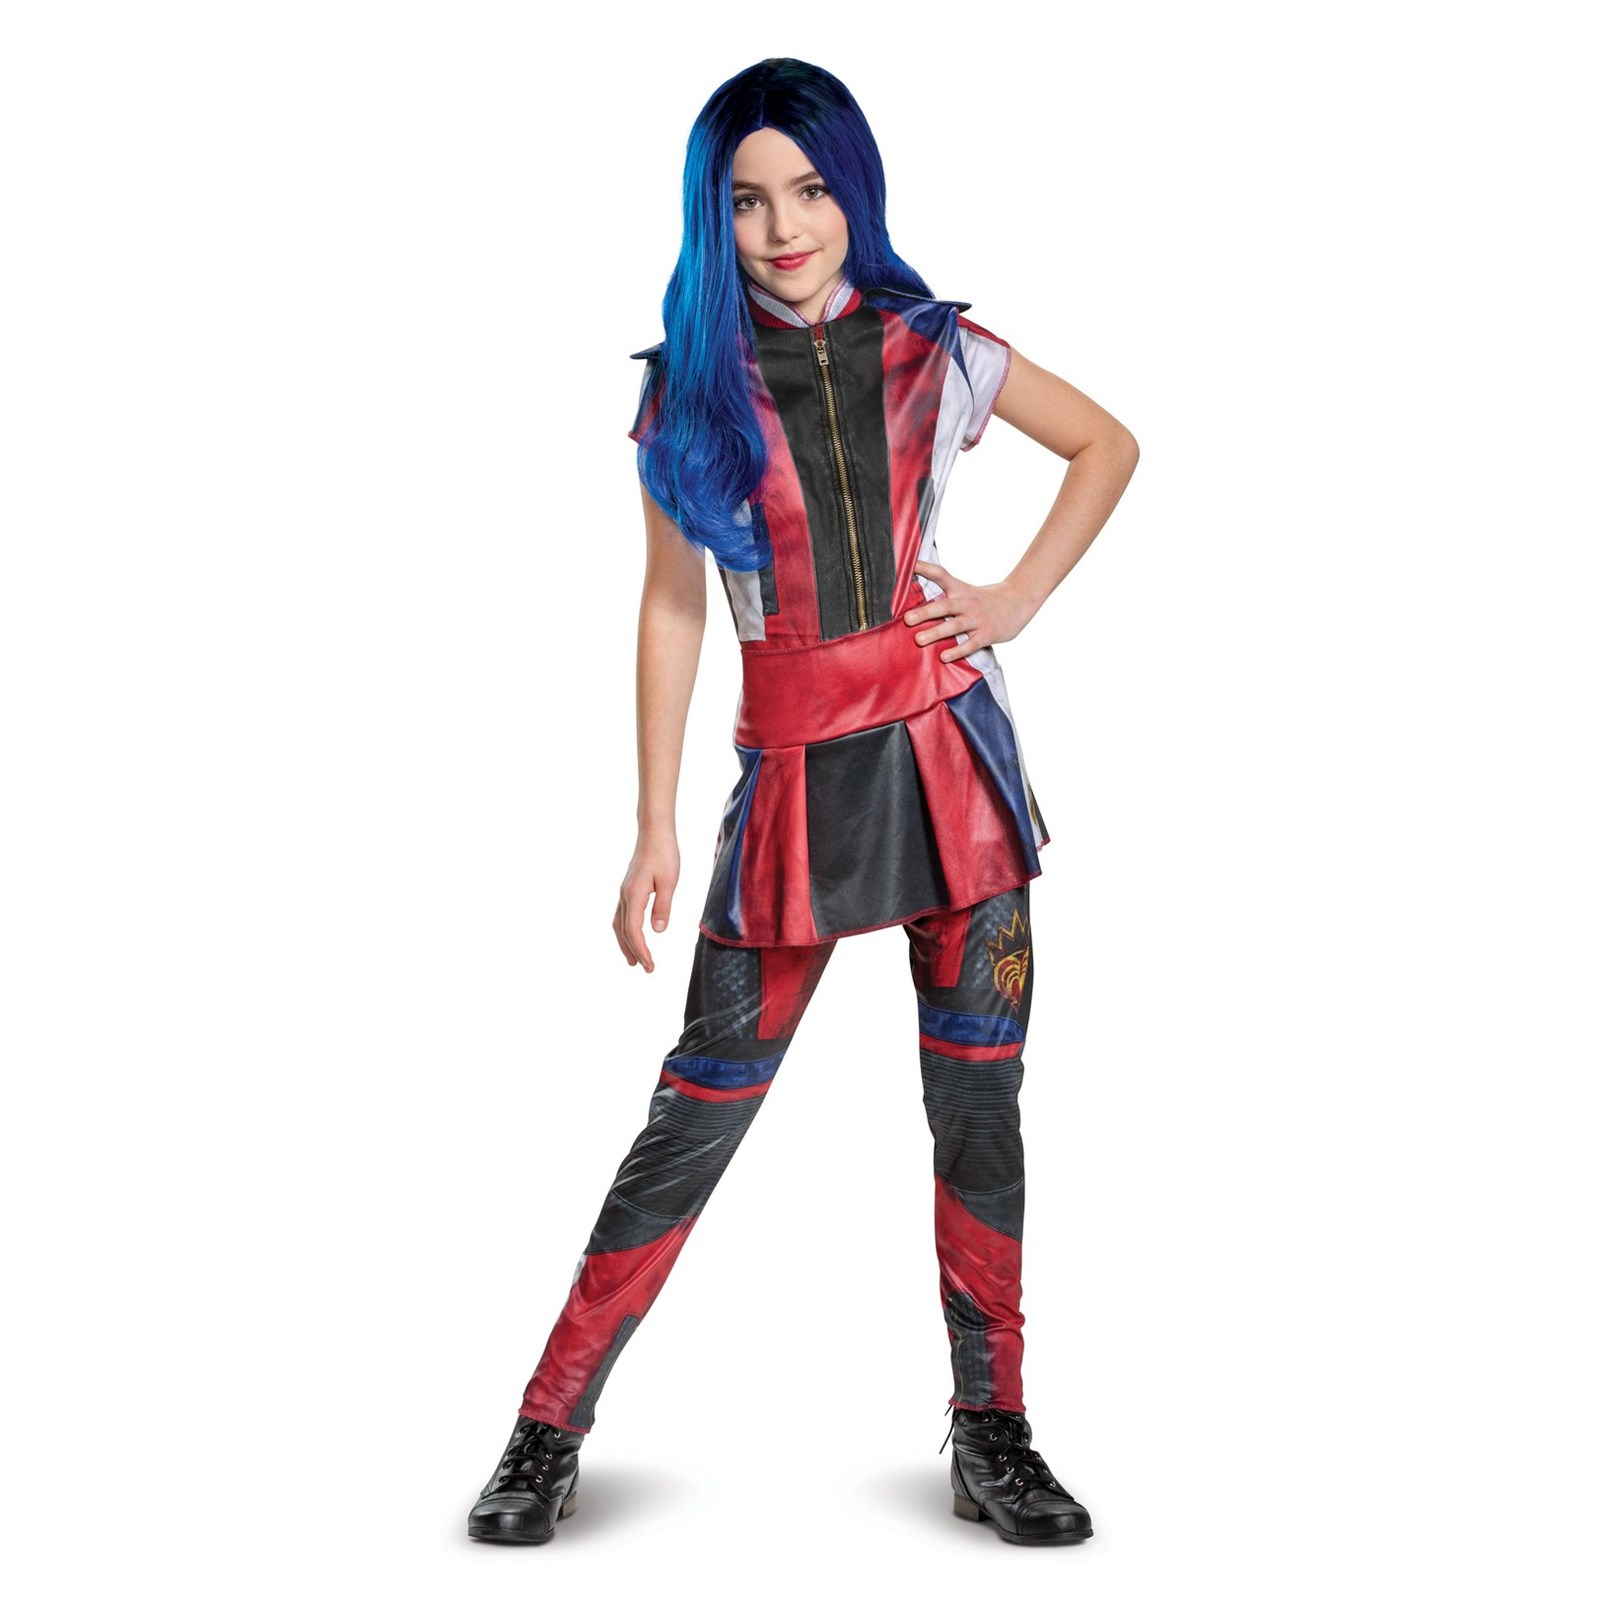 California Costumes Disco Dazzler Women Adult Halloween Costume Cosplay 01437